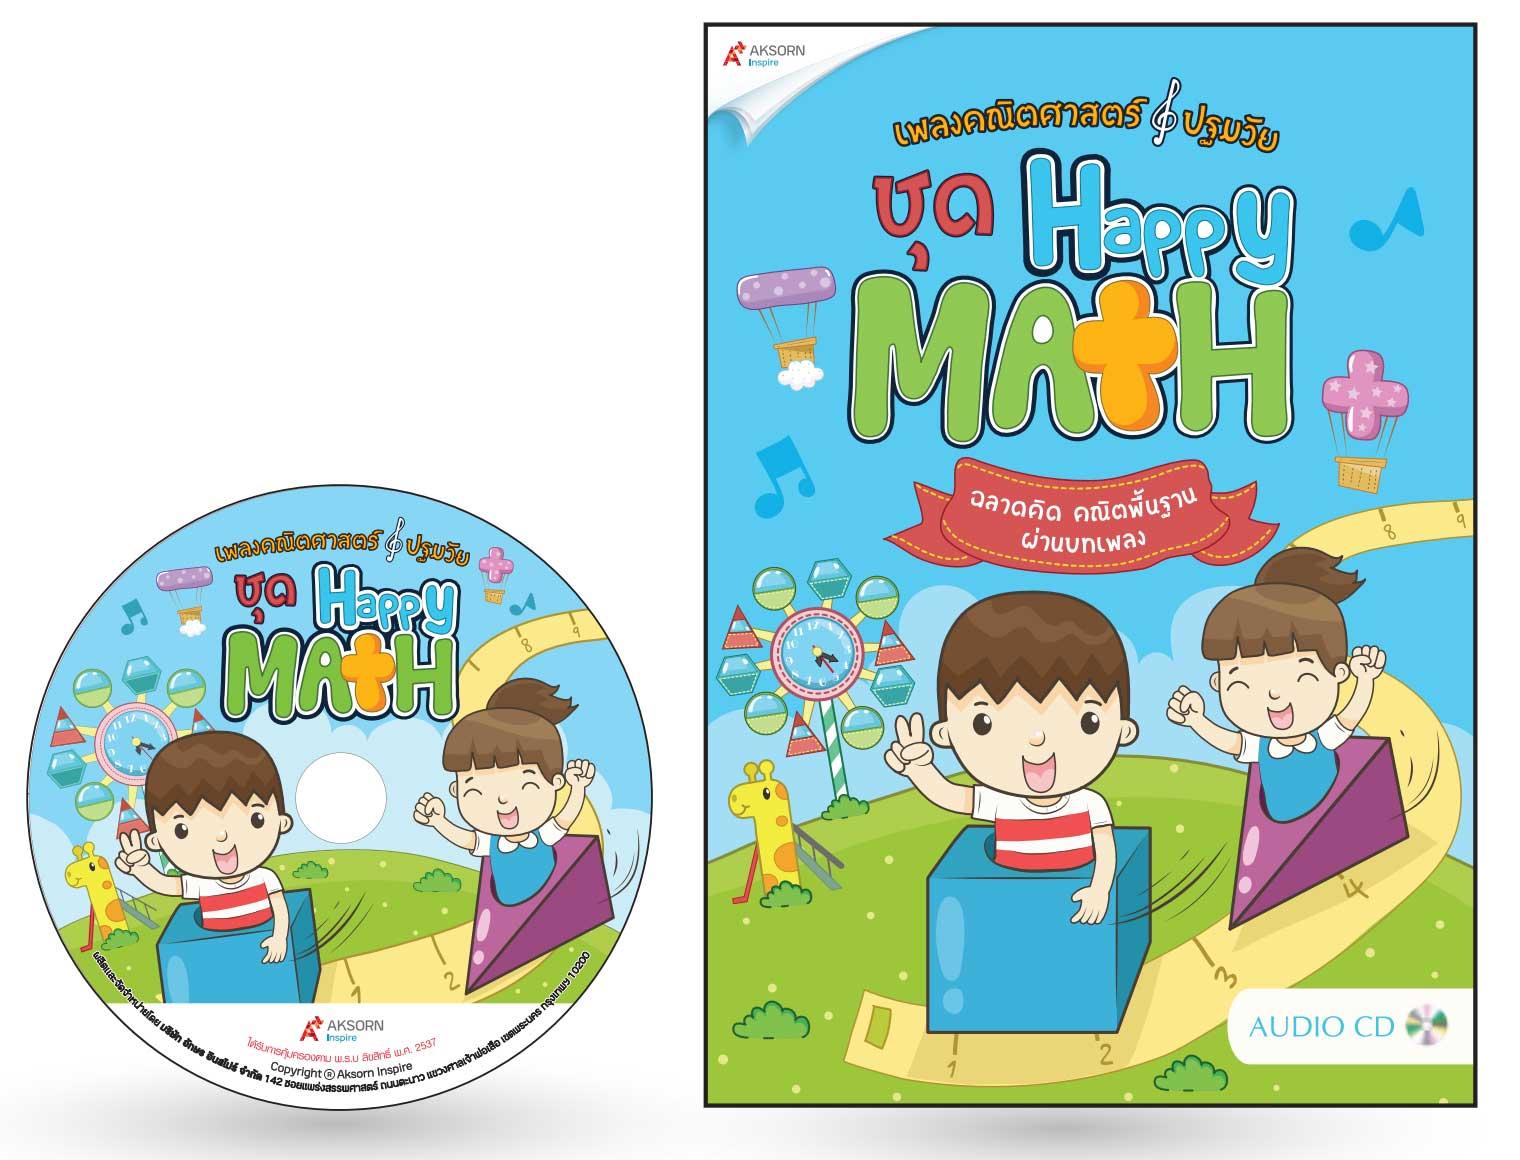 Audio CD เพลงคณิตศาสตร์ ชุด HAPPY MATH